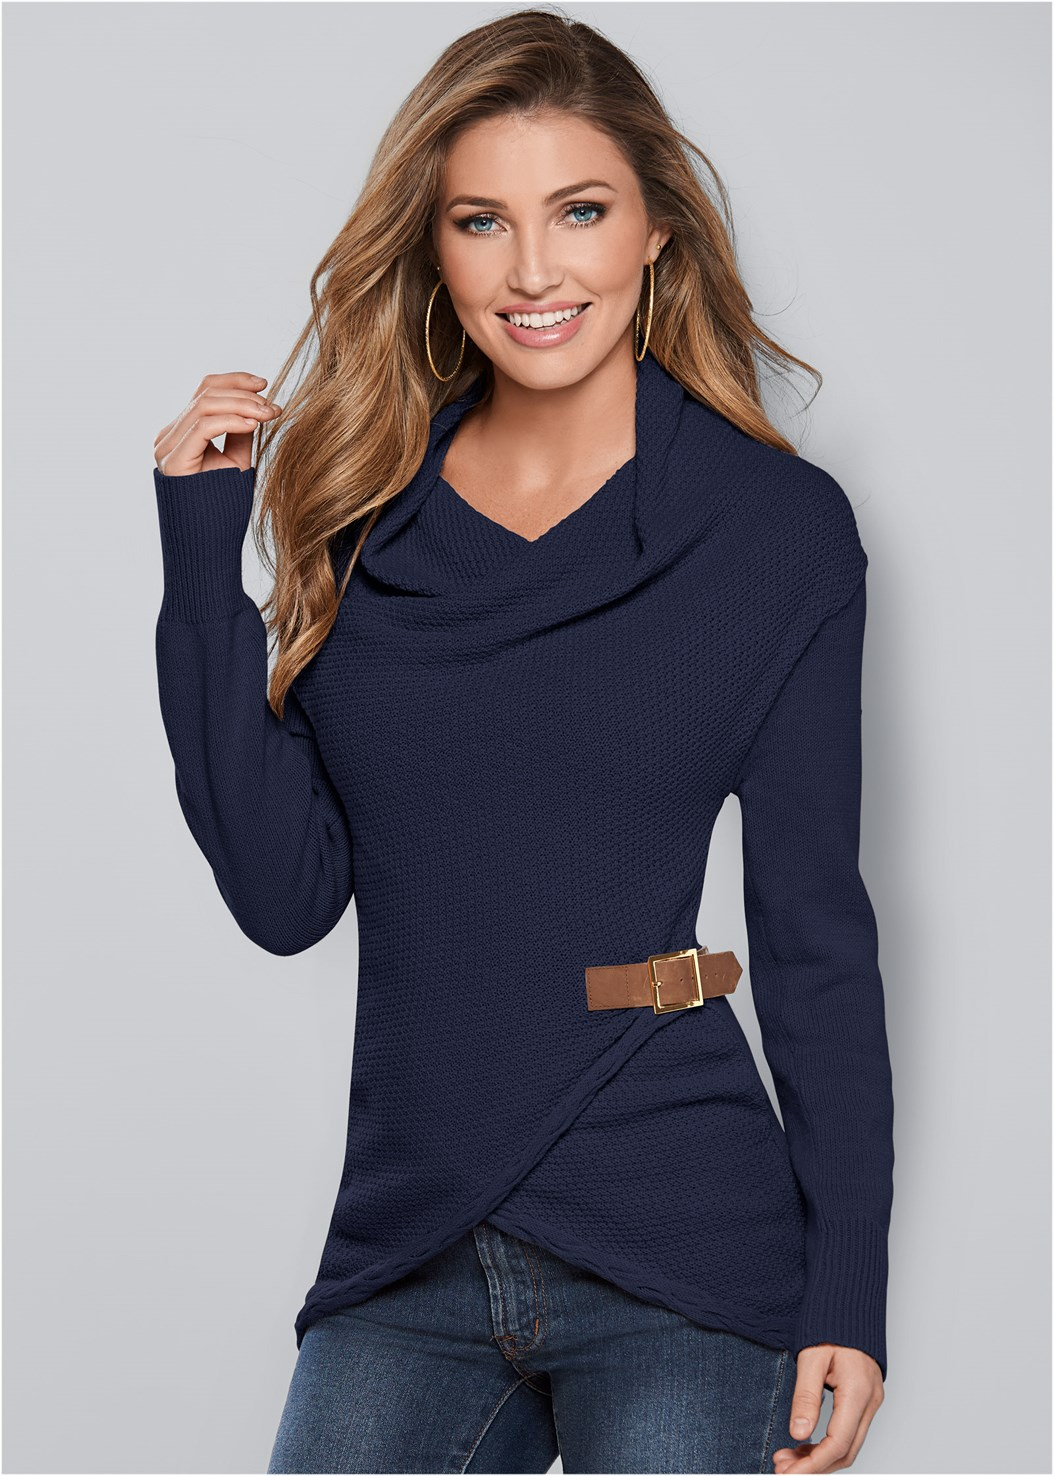 Side Buckle Detail Sweater,Sweater Buckle Bootie,Sweater Trim Boot